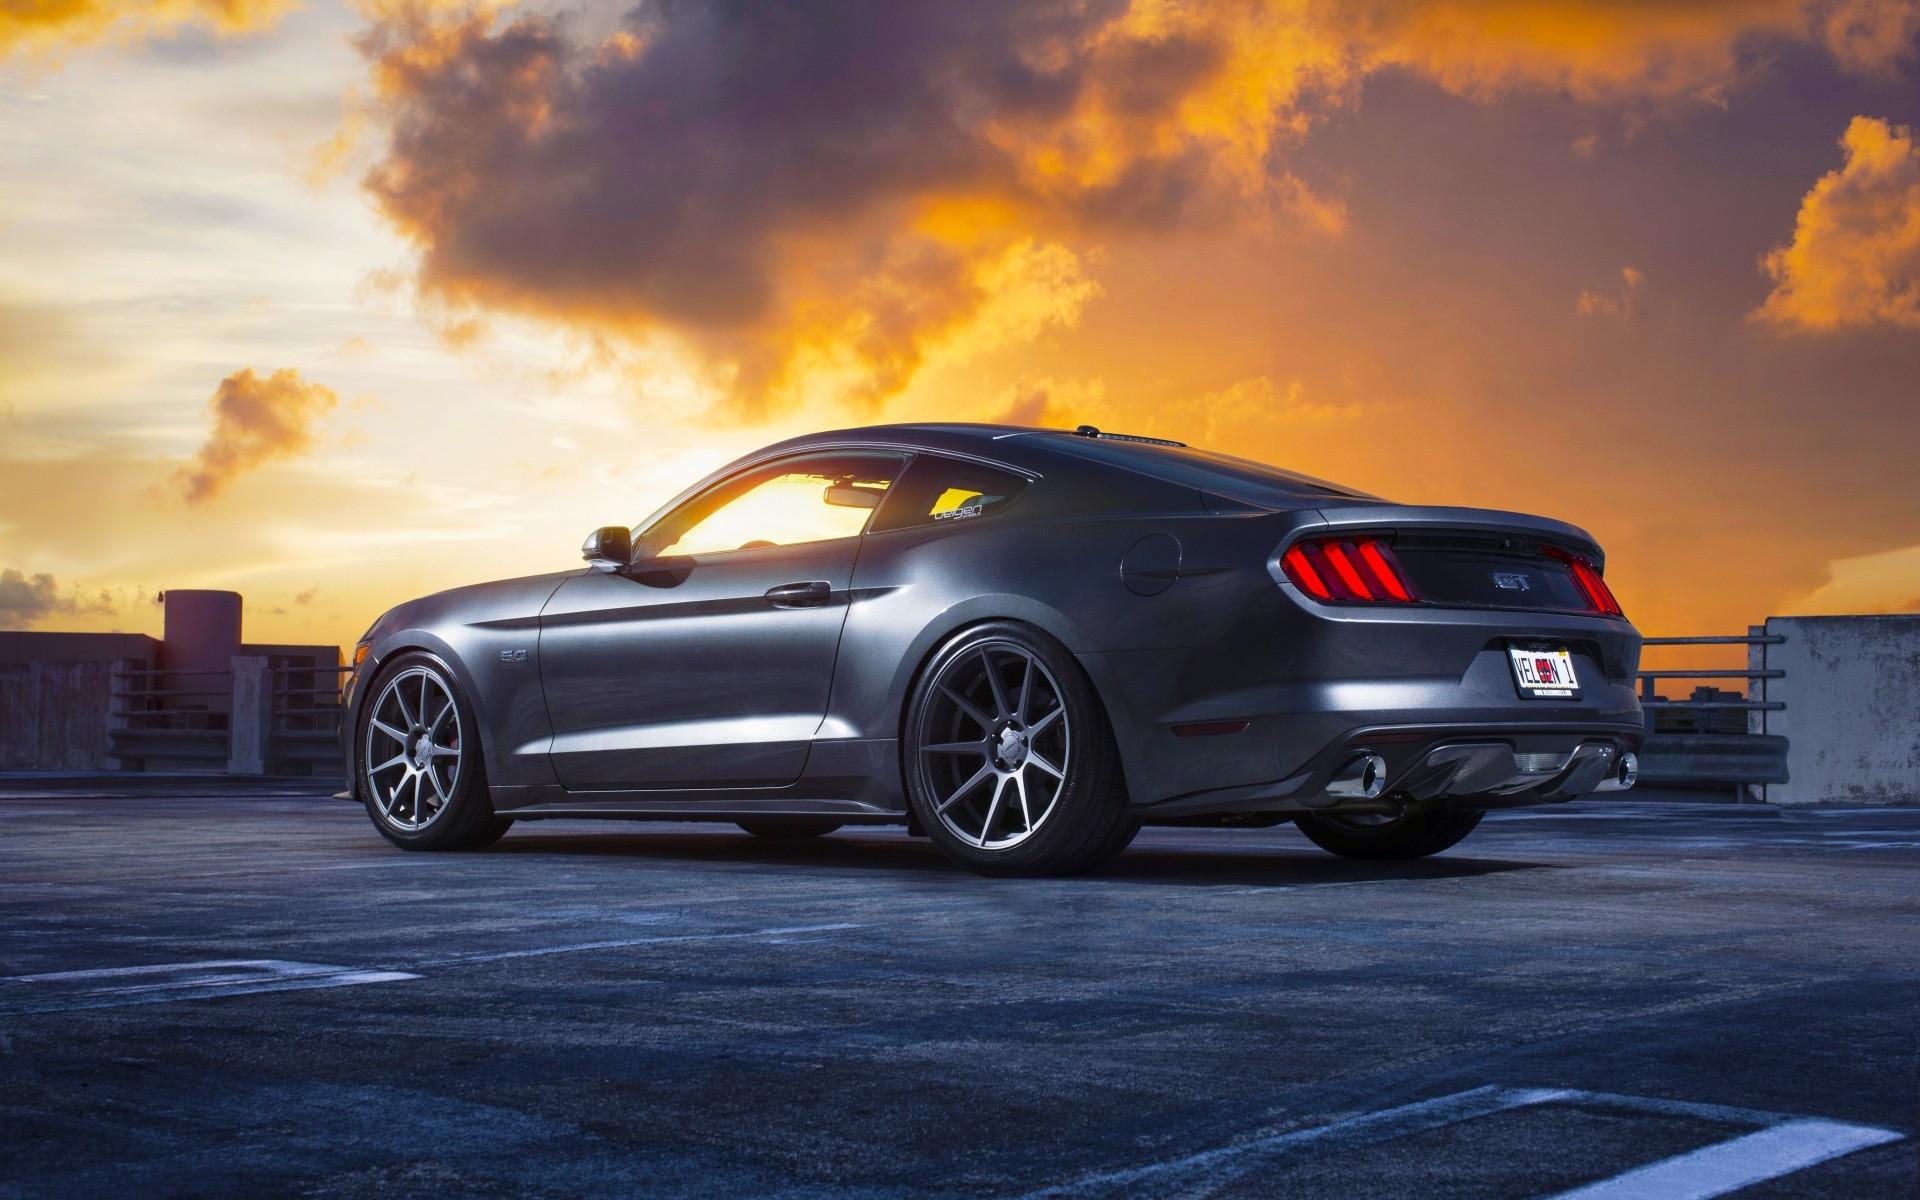 Velgen Wheels Mustang Gt 2380033 Hd Wallpaper